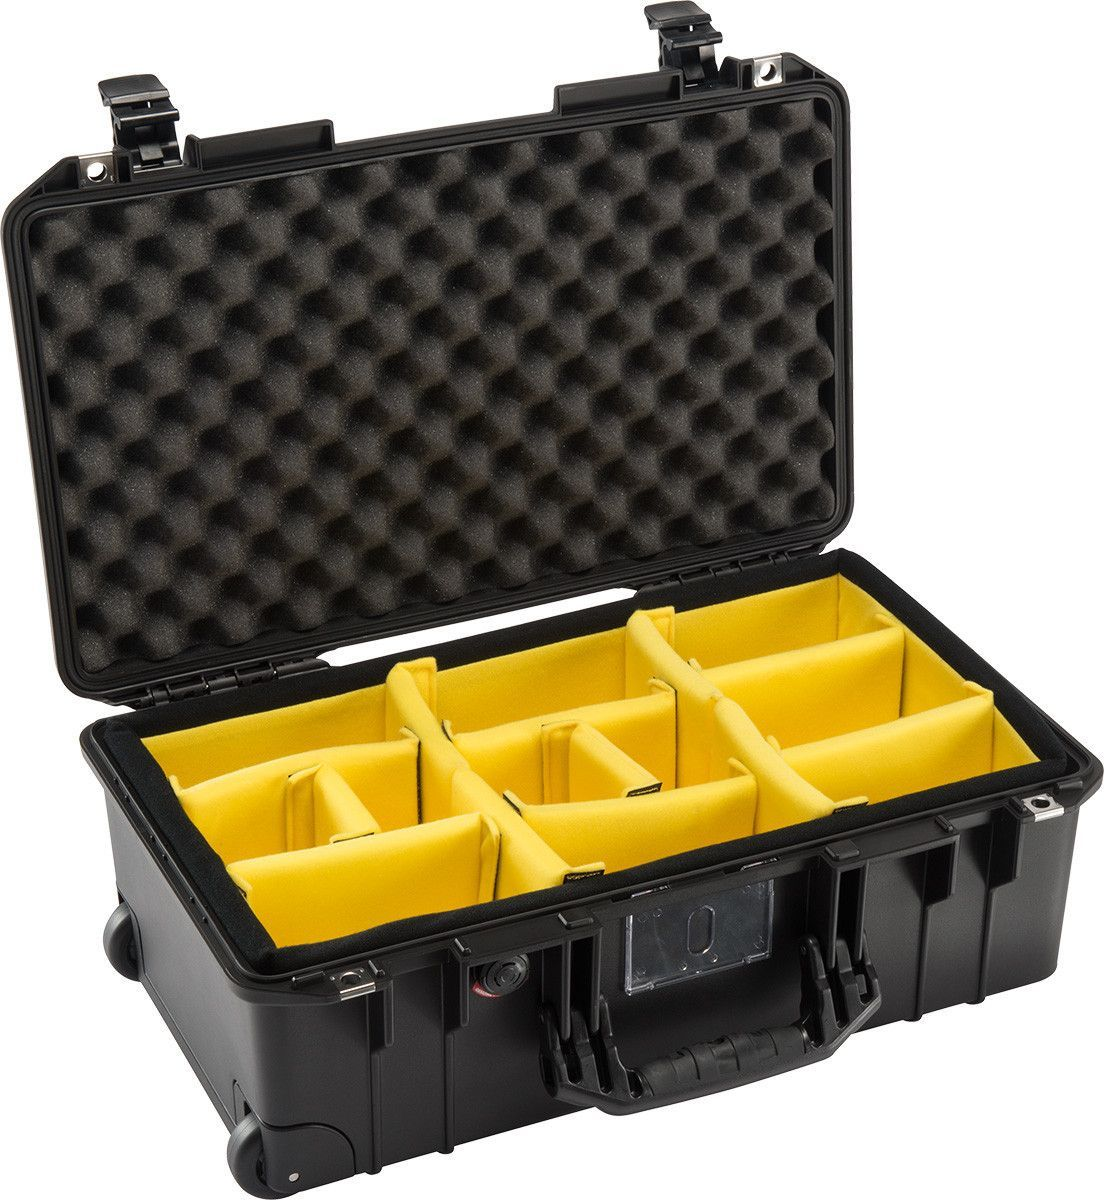 1535 Air Case Pelican case, Camera case, Protective cases